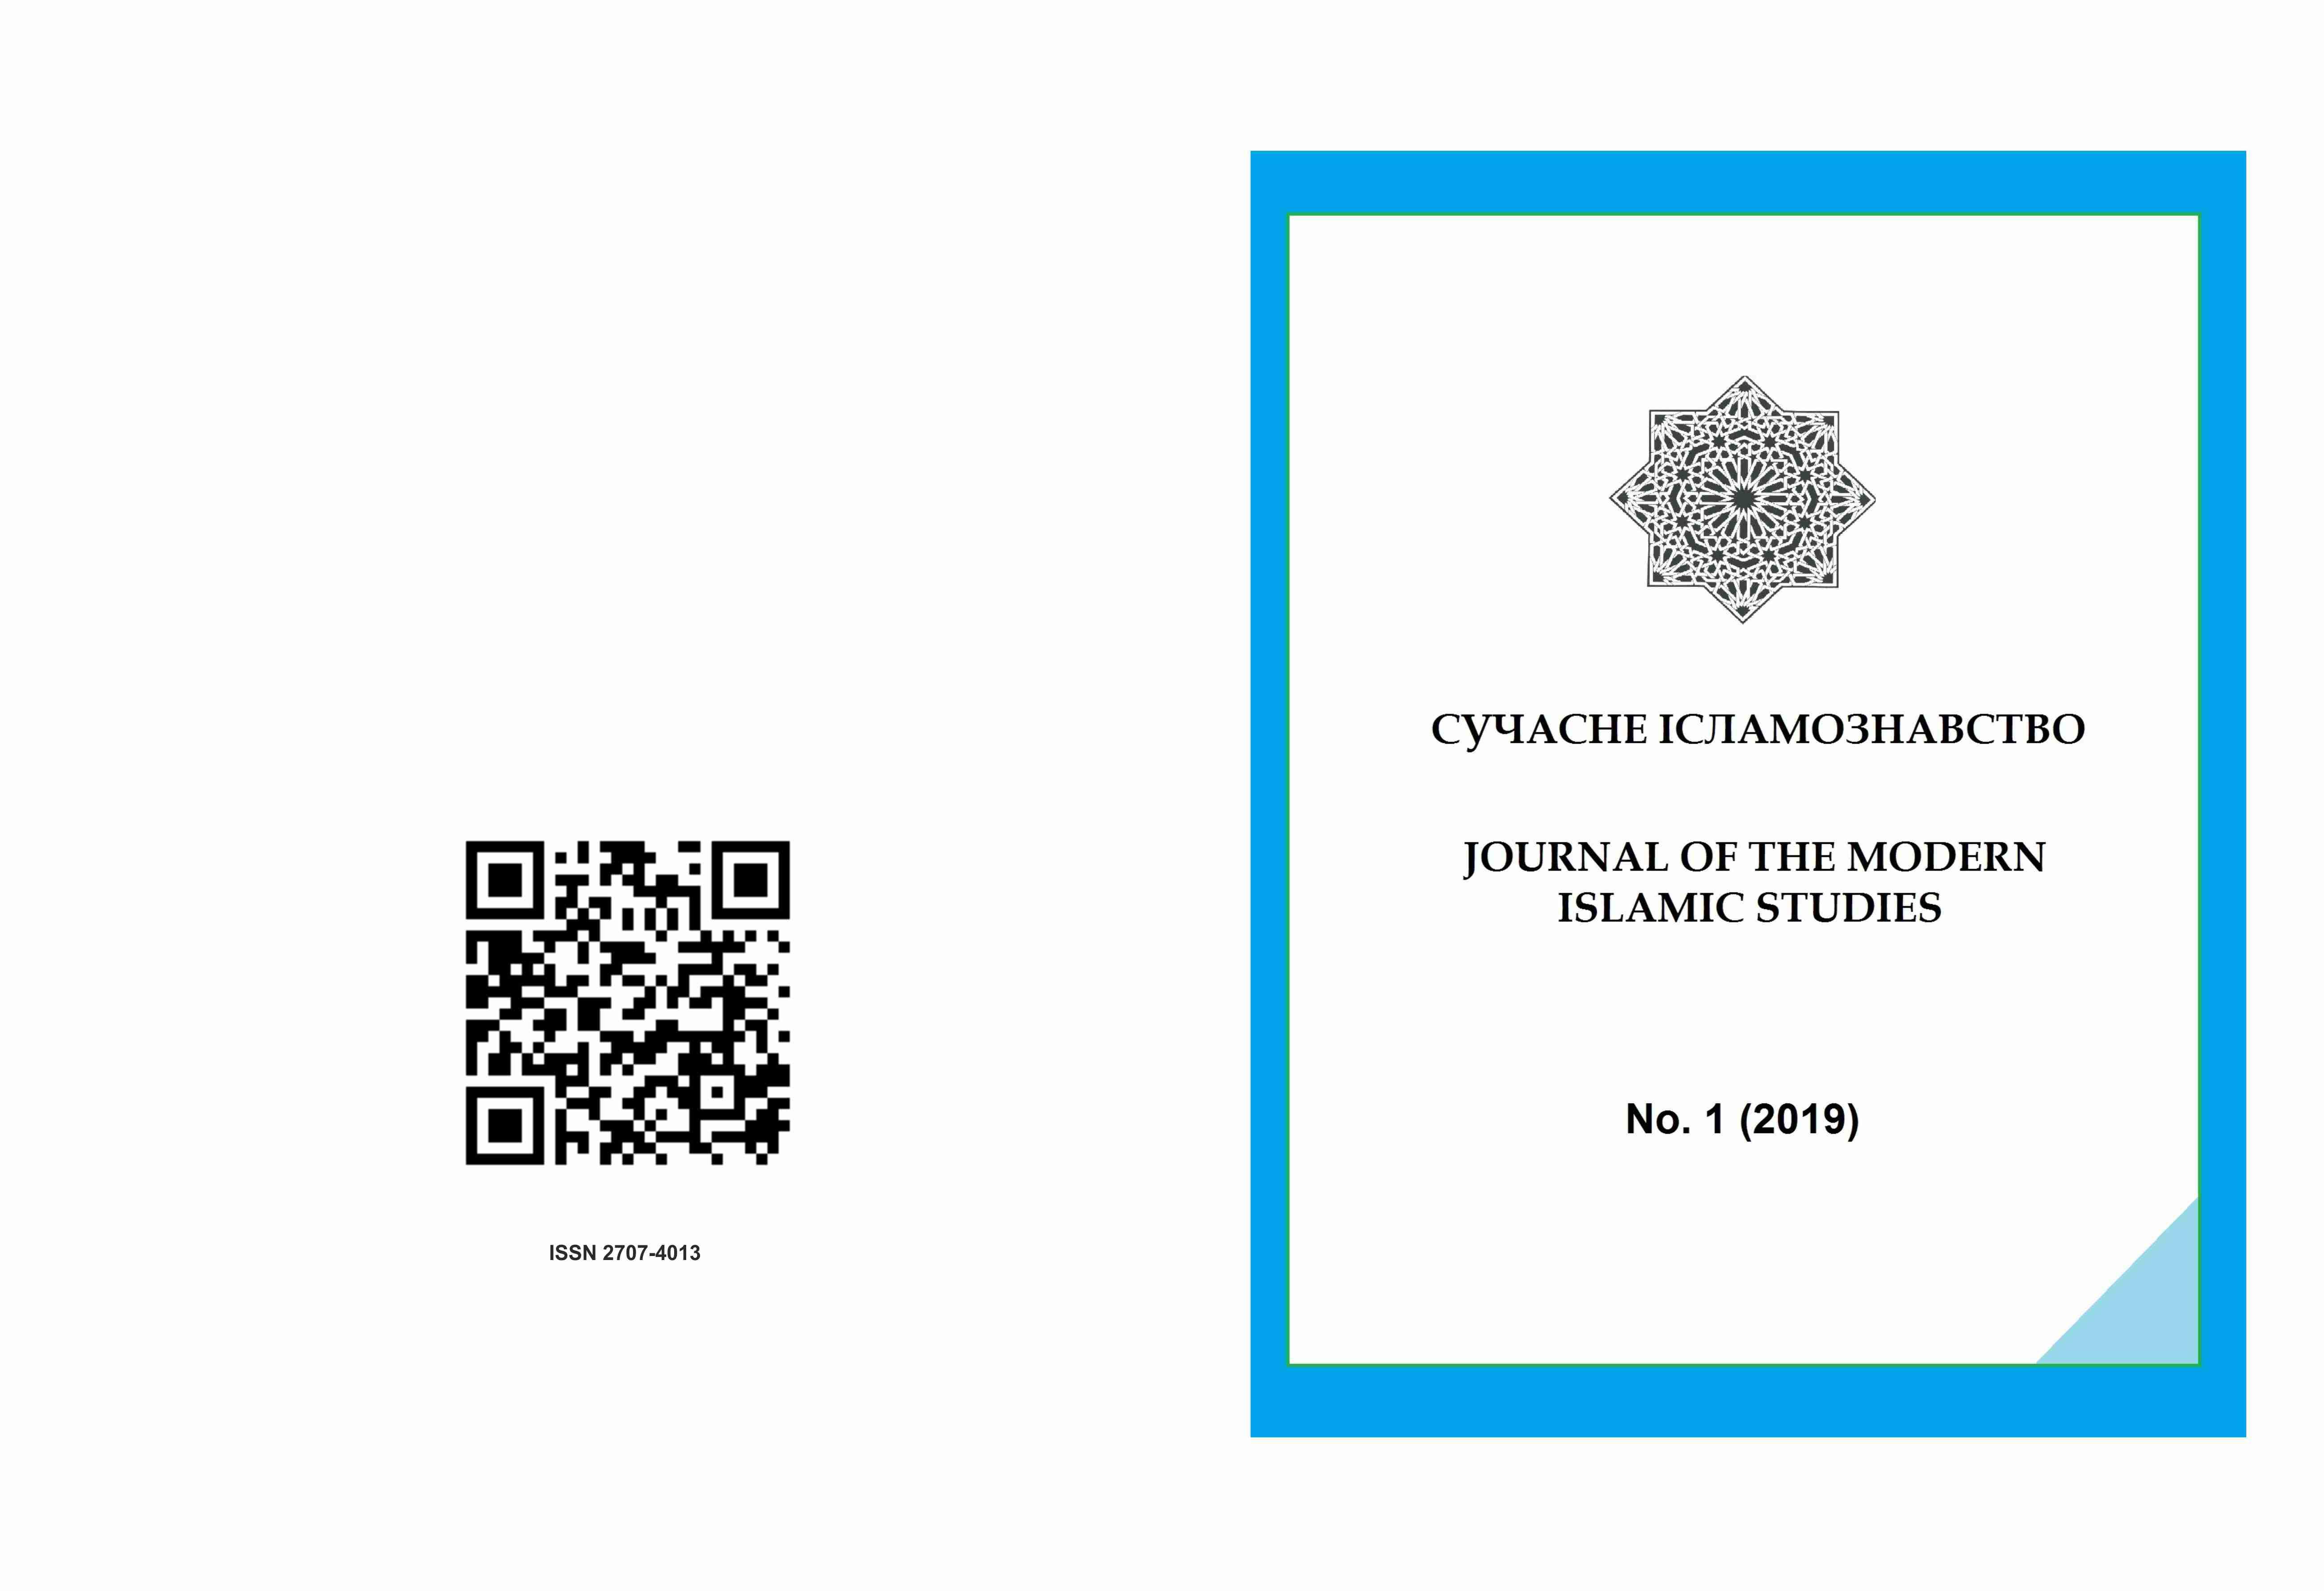 View Vol. 1 No. 1 (2019): Journal of the Modern Islamic Studies: scientific journal.